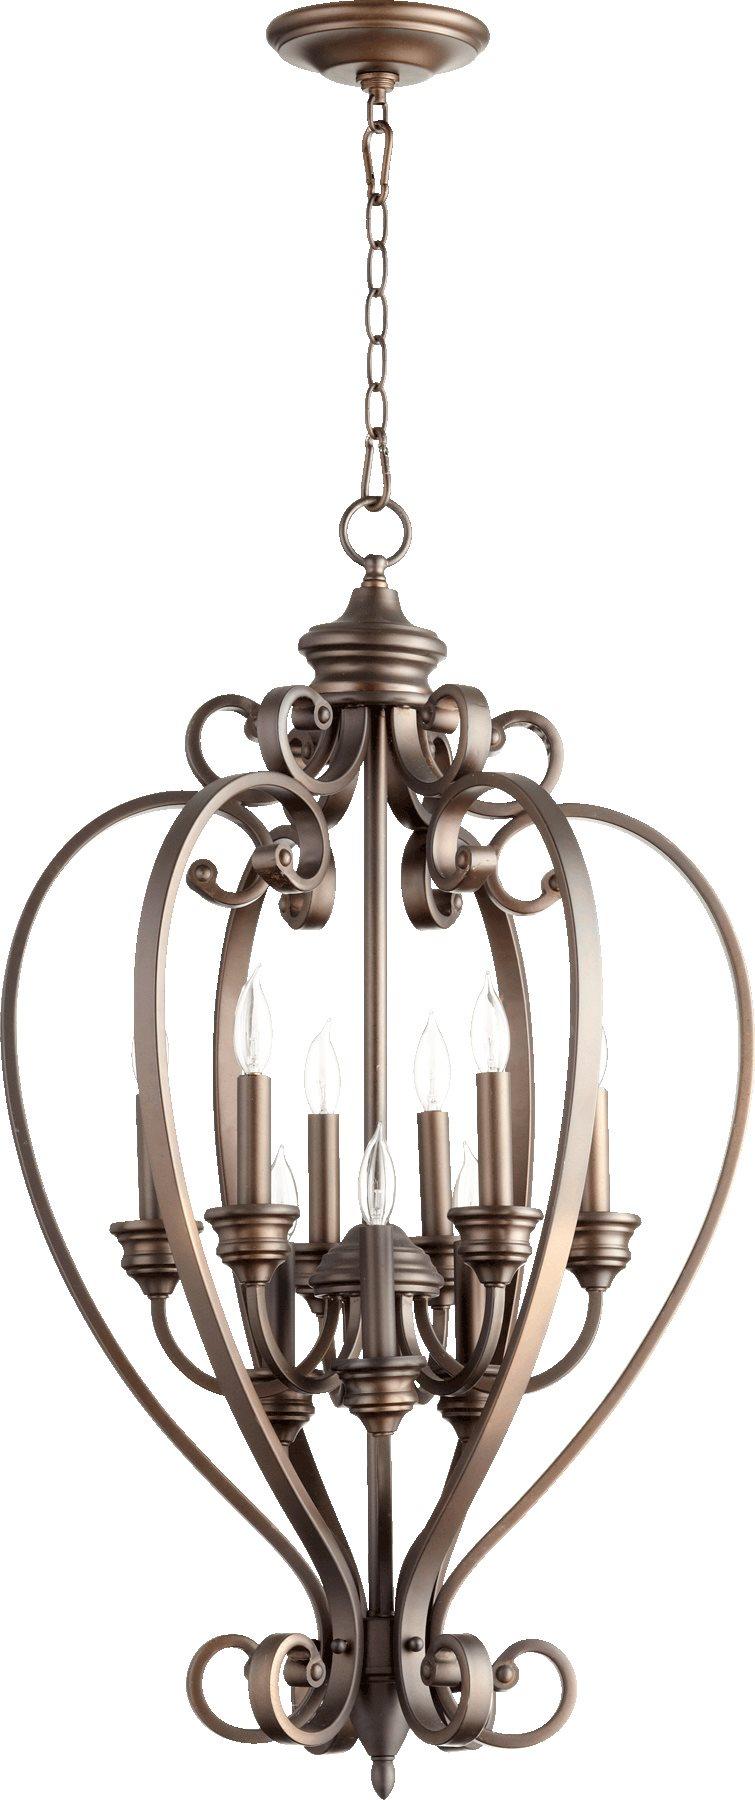 Traditional Foyer Lighting : Quorum lighting  bryant traditional foyer light